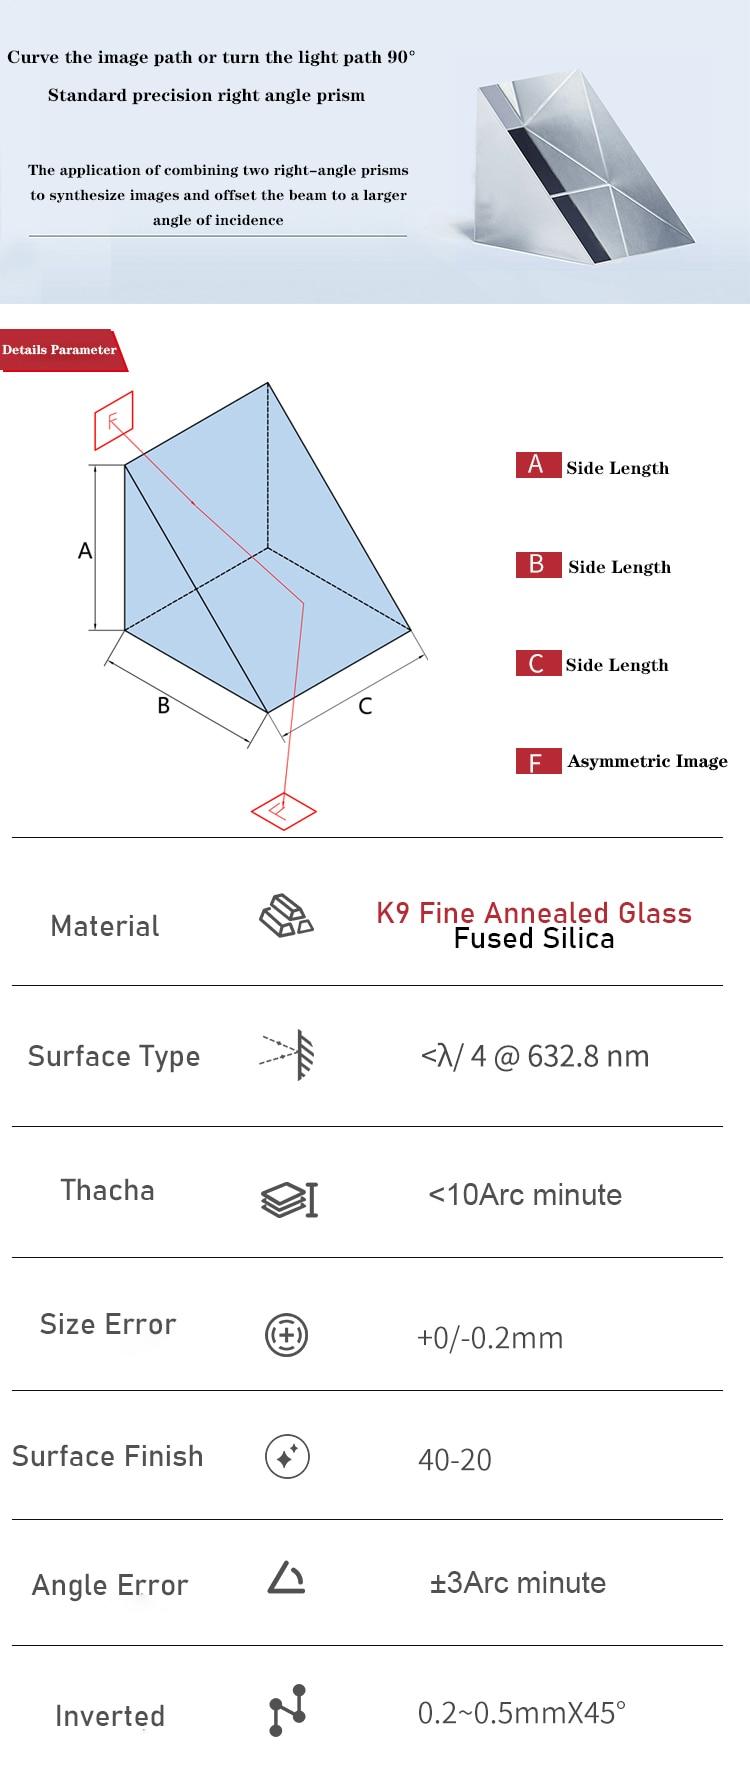 de vidro óptico grande ângulo direito